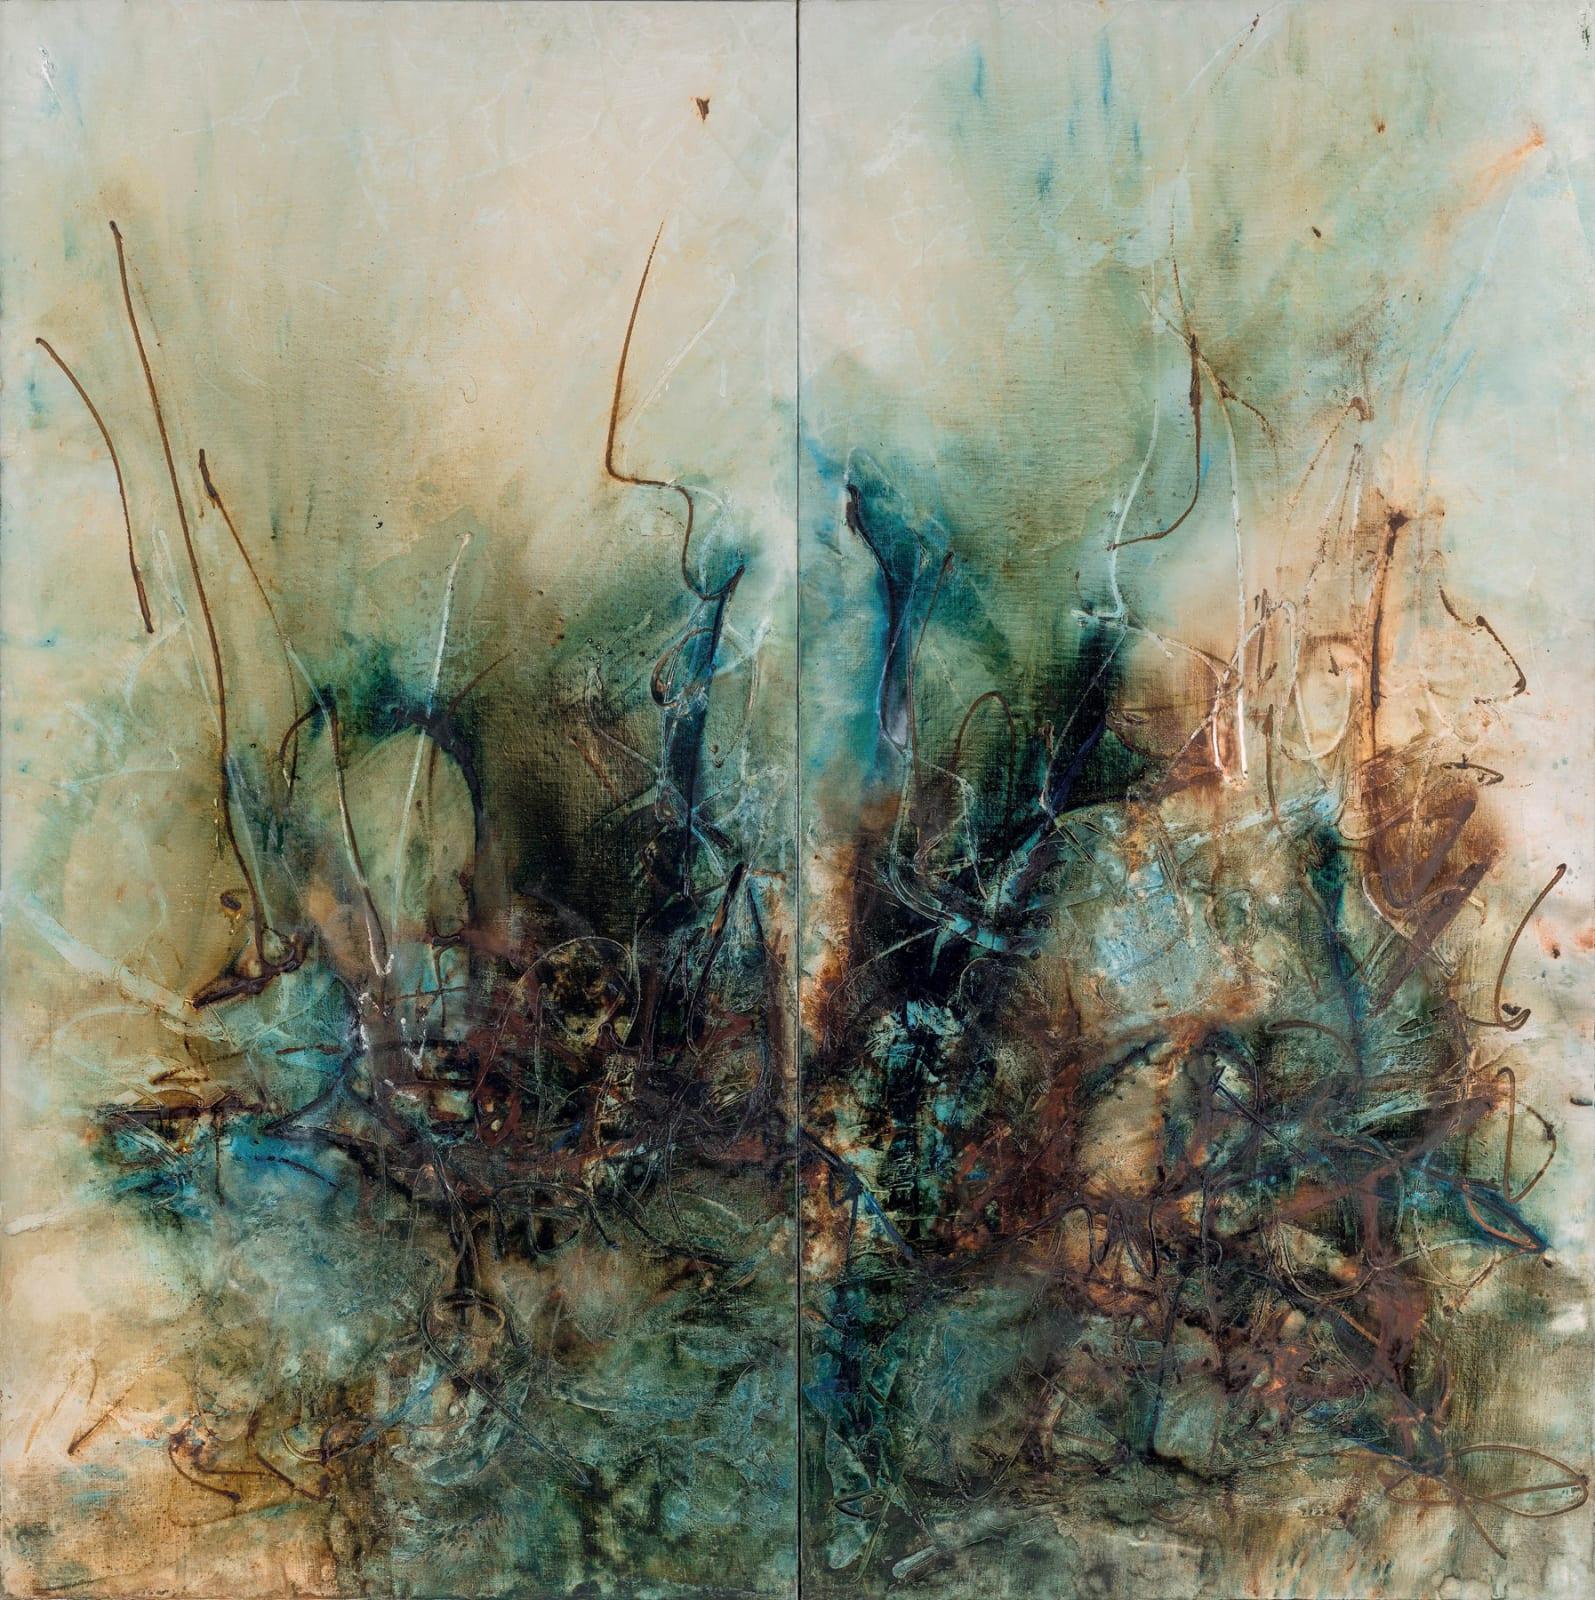 Lalan 謝景蘭, Va avec le vent | Go with the Wind 《隨風飄逝》, 1968